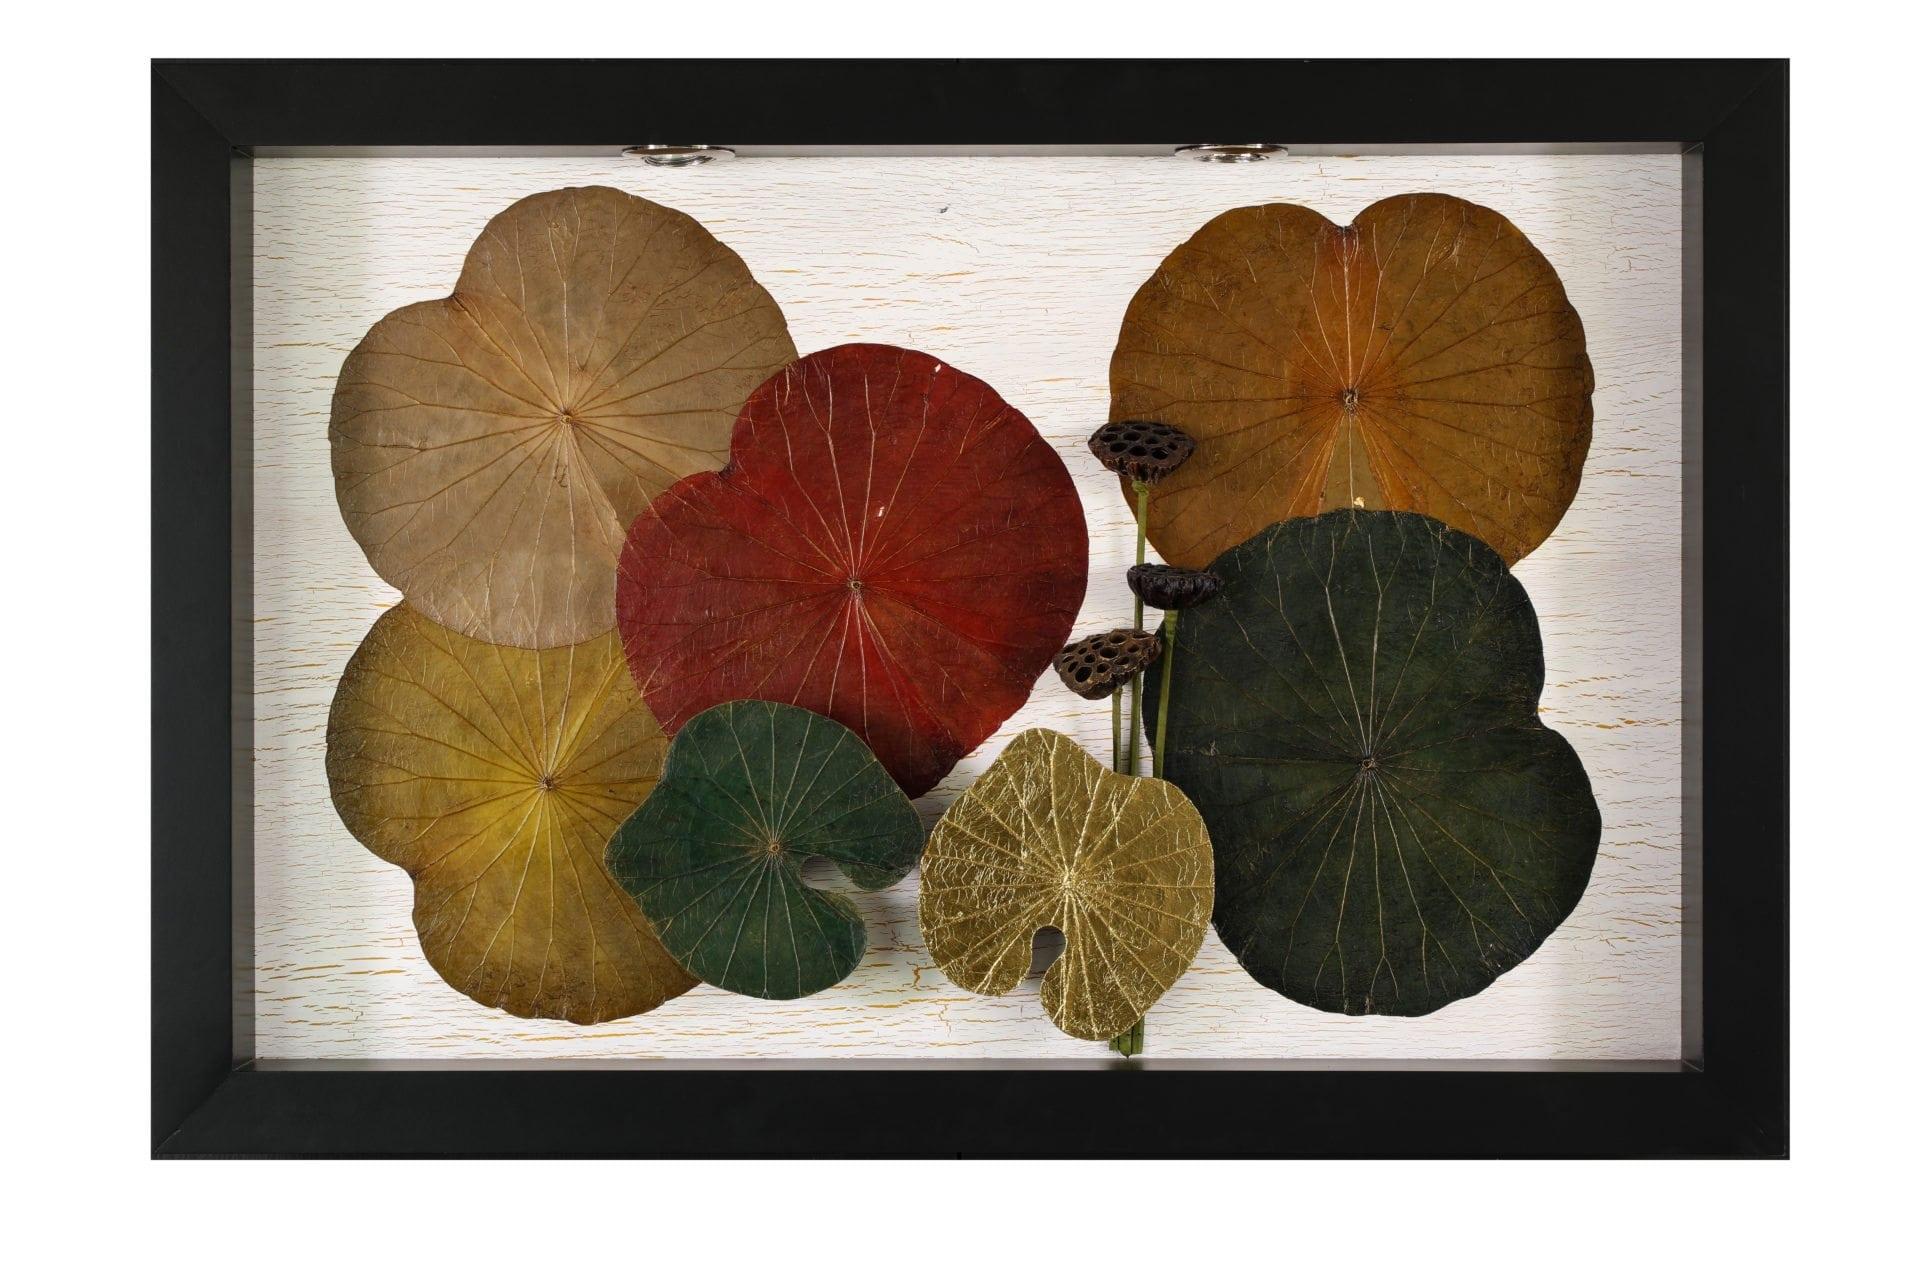 Leaf Wall Art lotus leaves wall art & decor | monkeypod asia